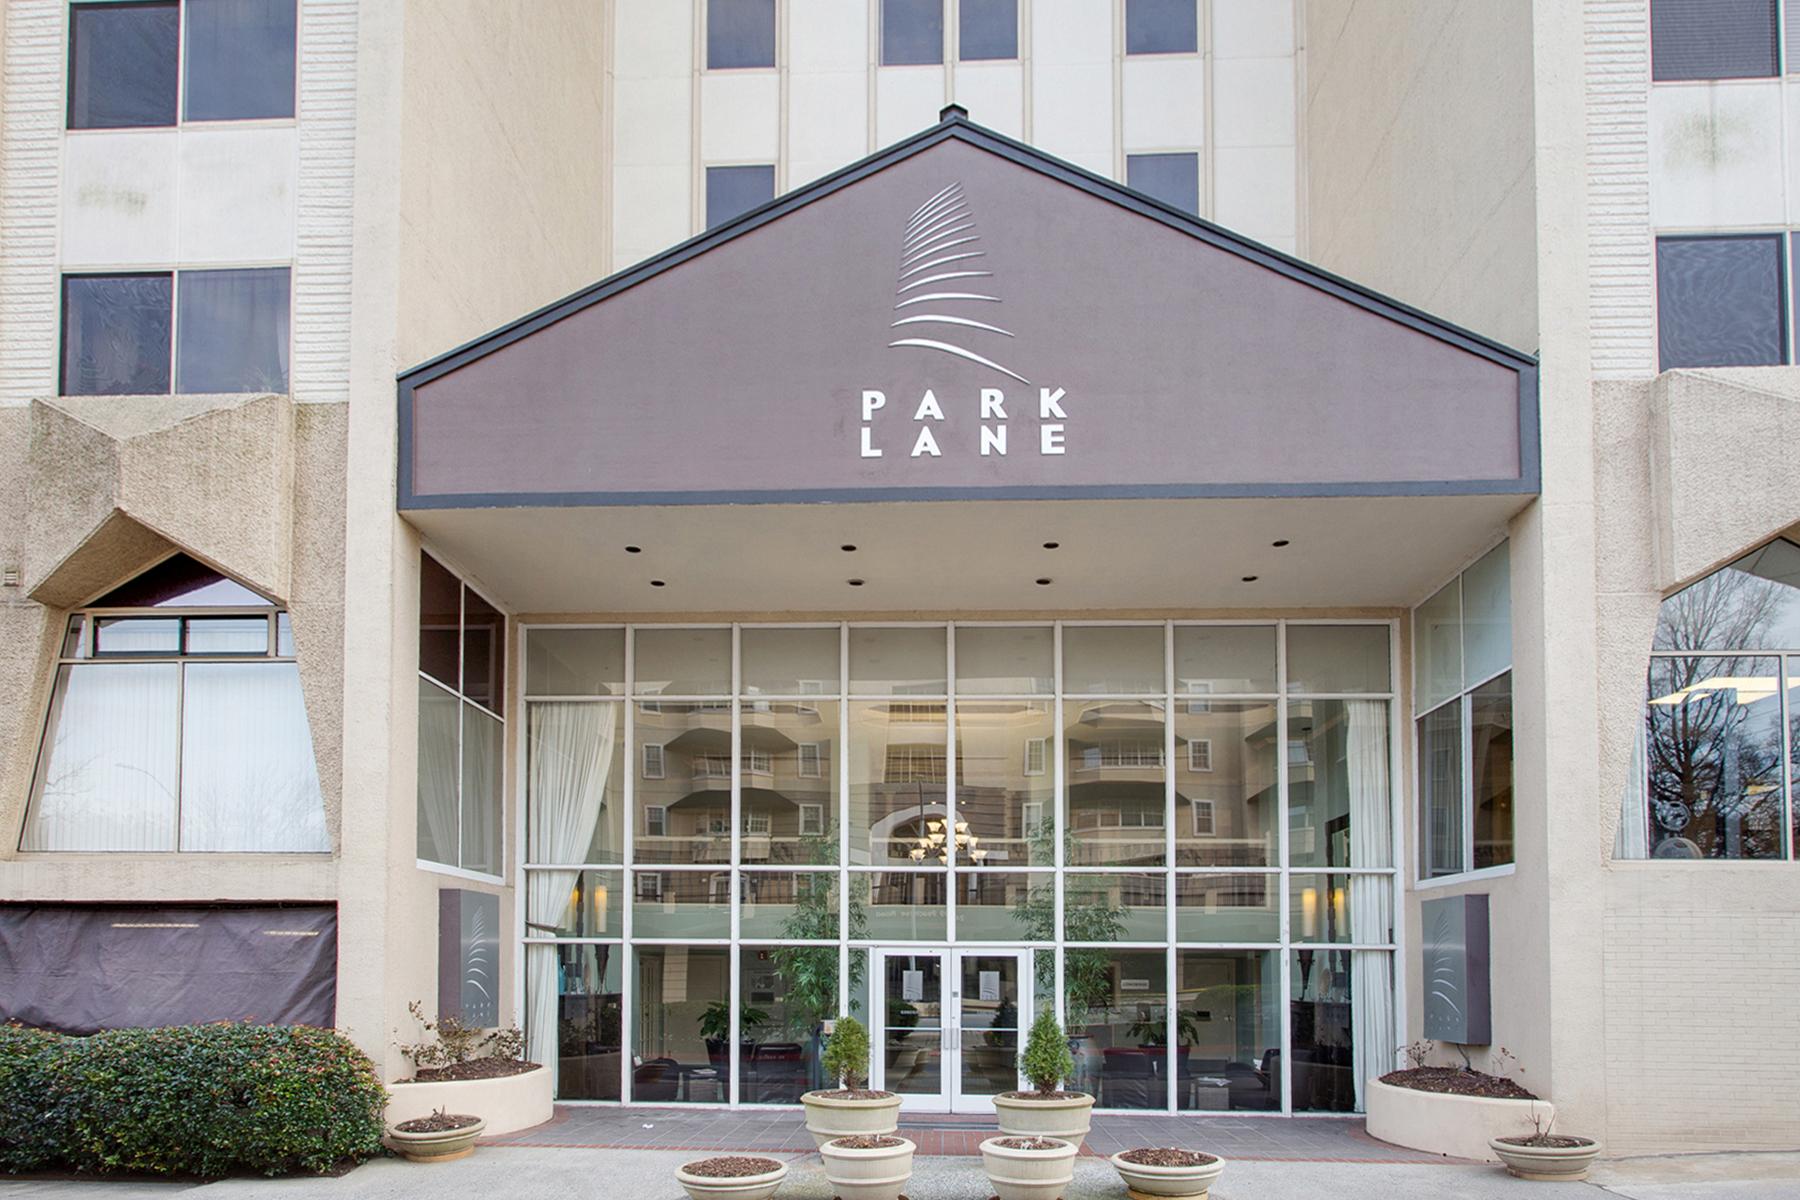 Condominium for Sale at Charming Buckhead Condo 2479 Peachtree Road NE No. 1004 Atlanta, Georgia 30305 United States